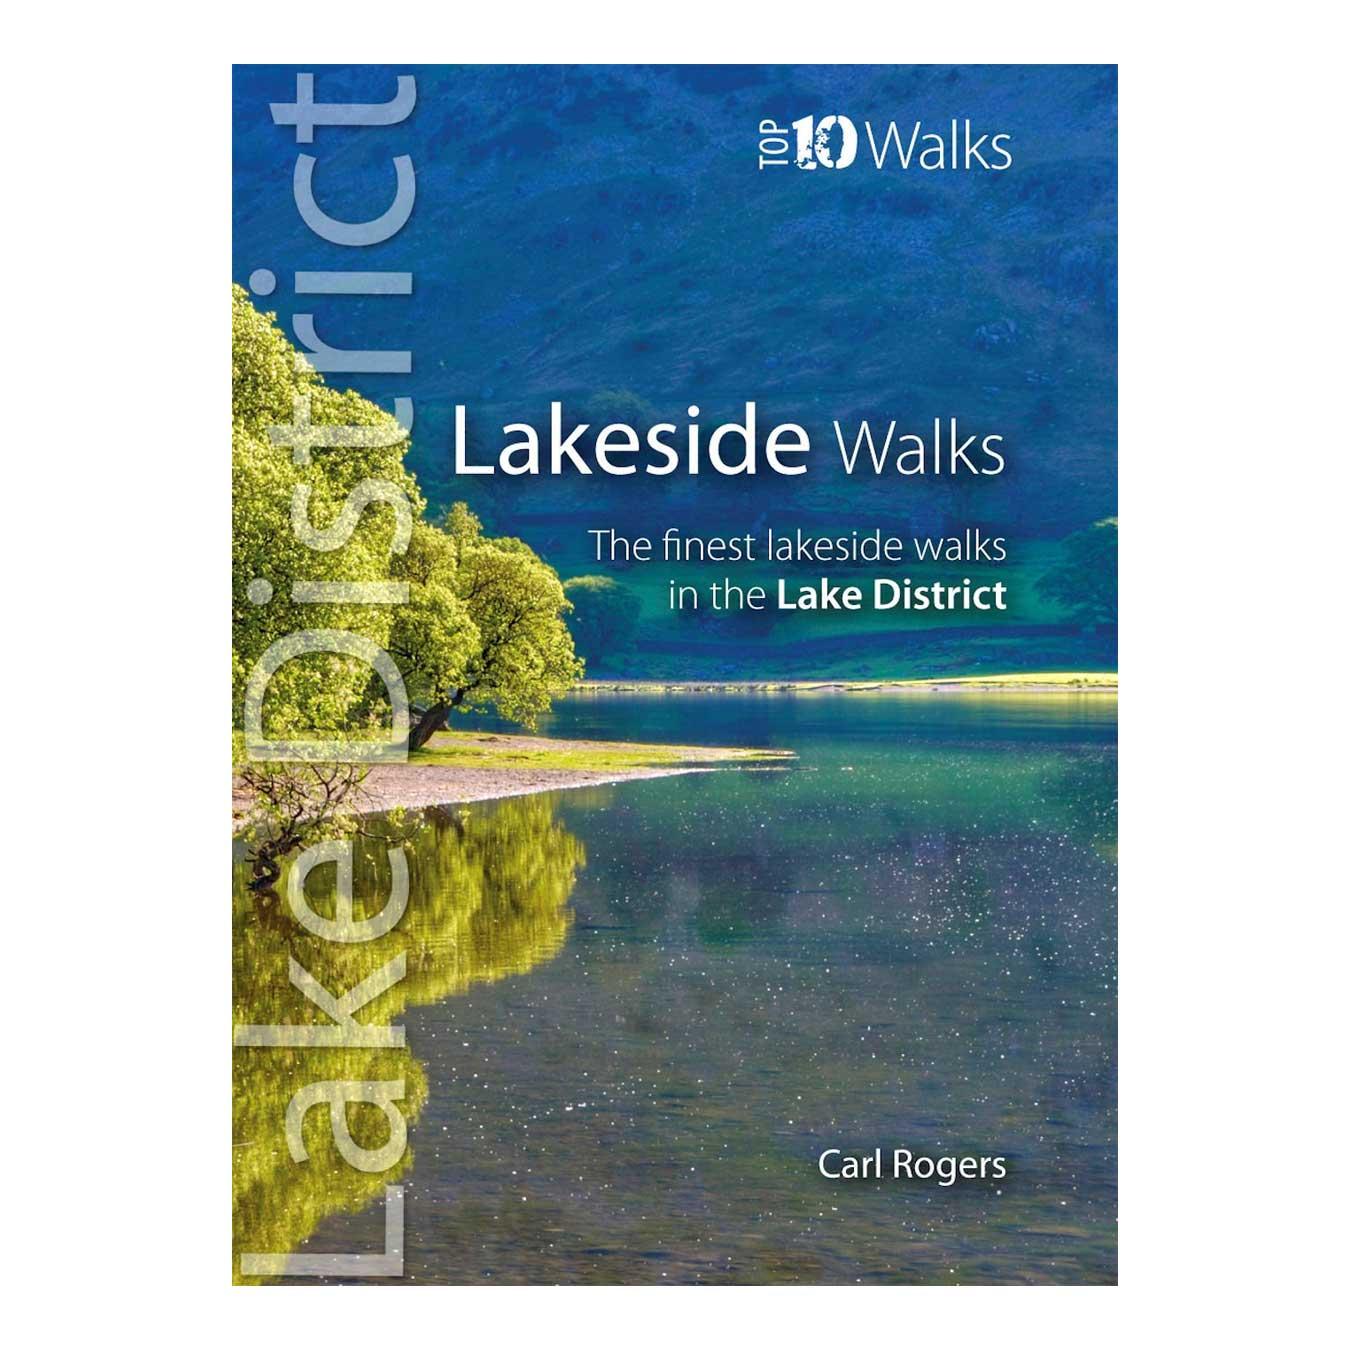 Lakeside Walks: Classic Lakeside Walks in Cumbria (Top 10 Walks)